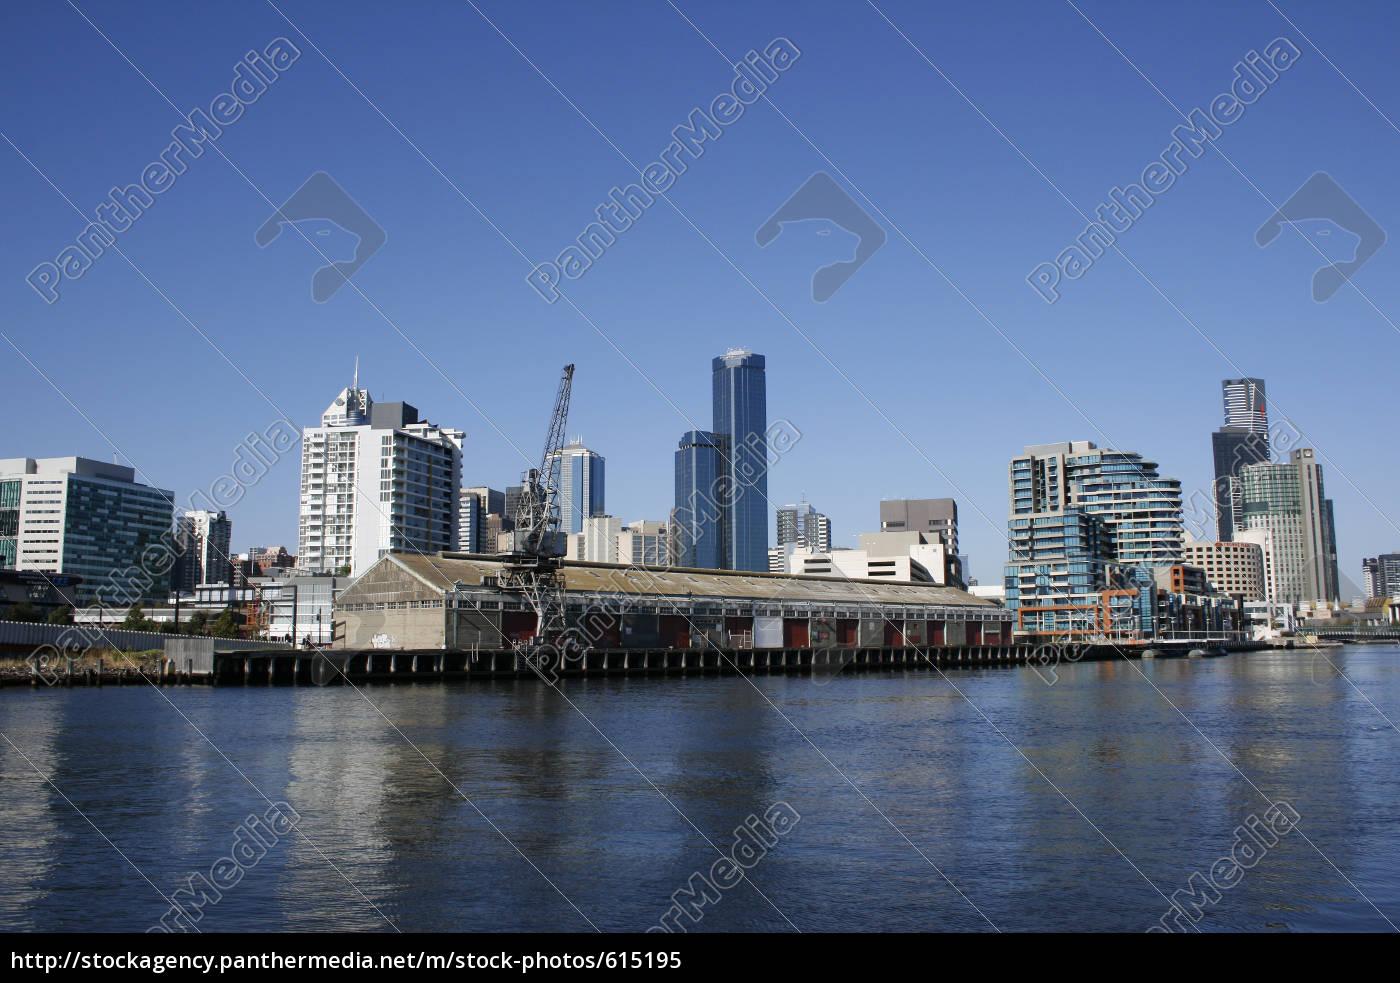 harbor, area - 615195